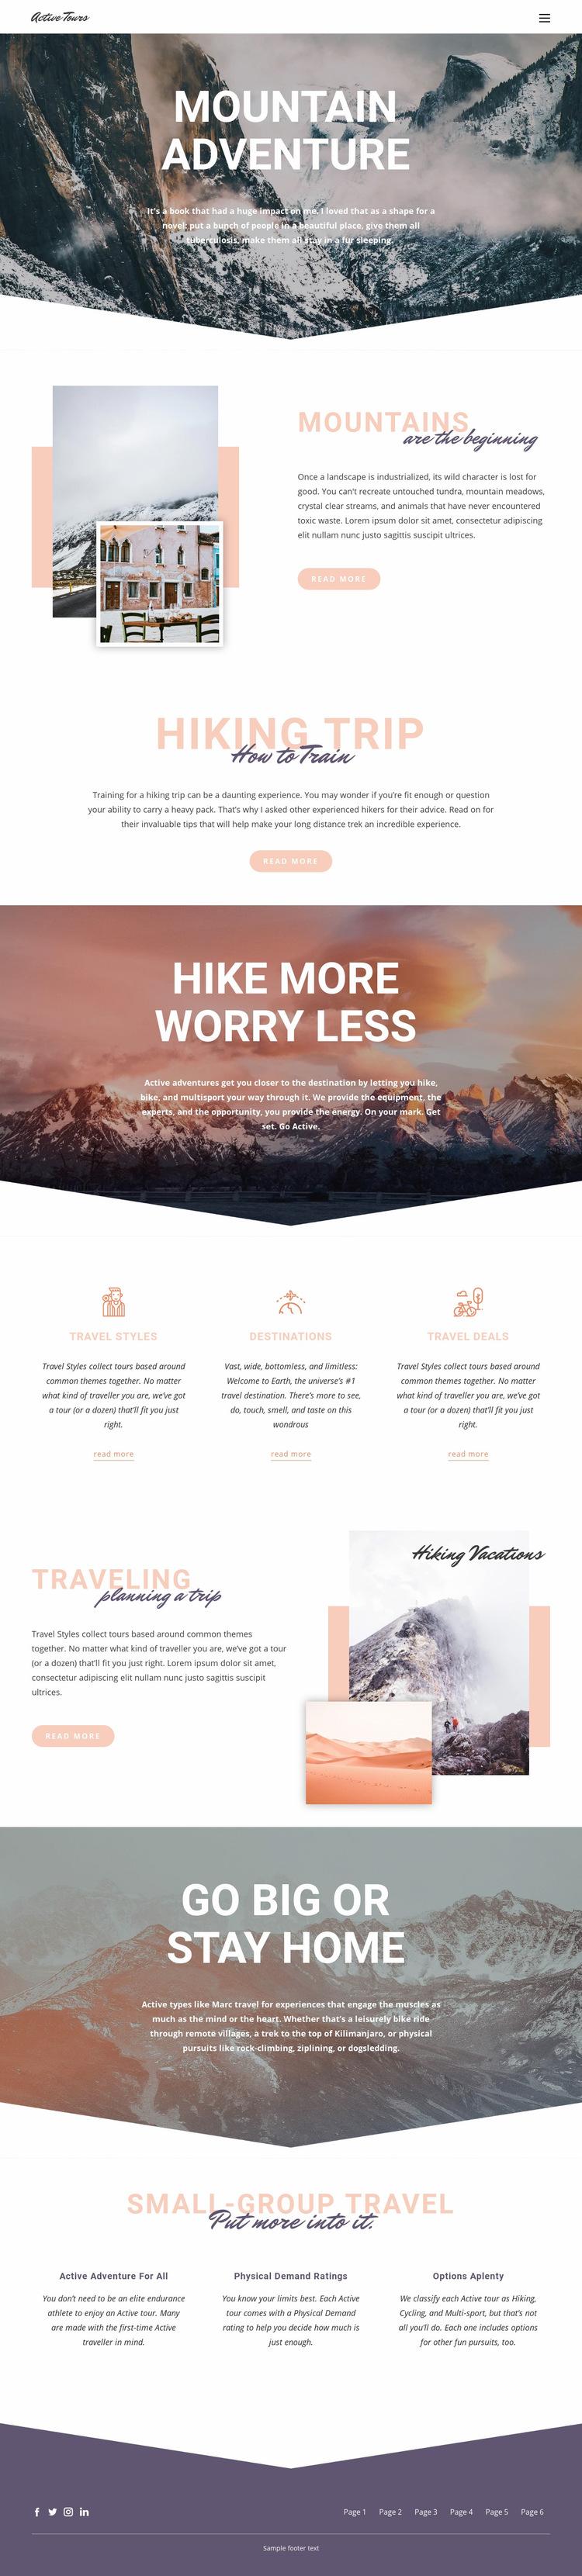 Mountain Adventure Web Page Design